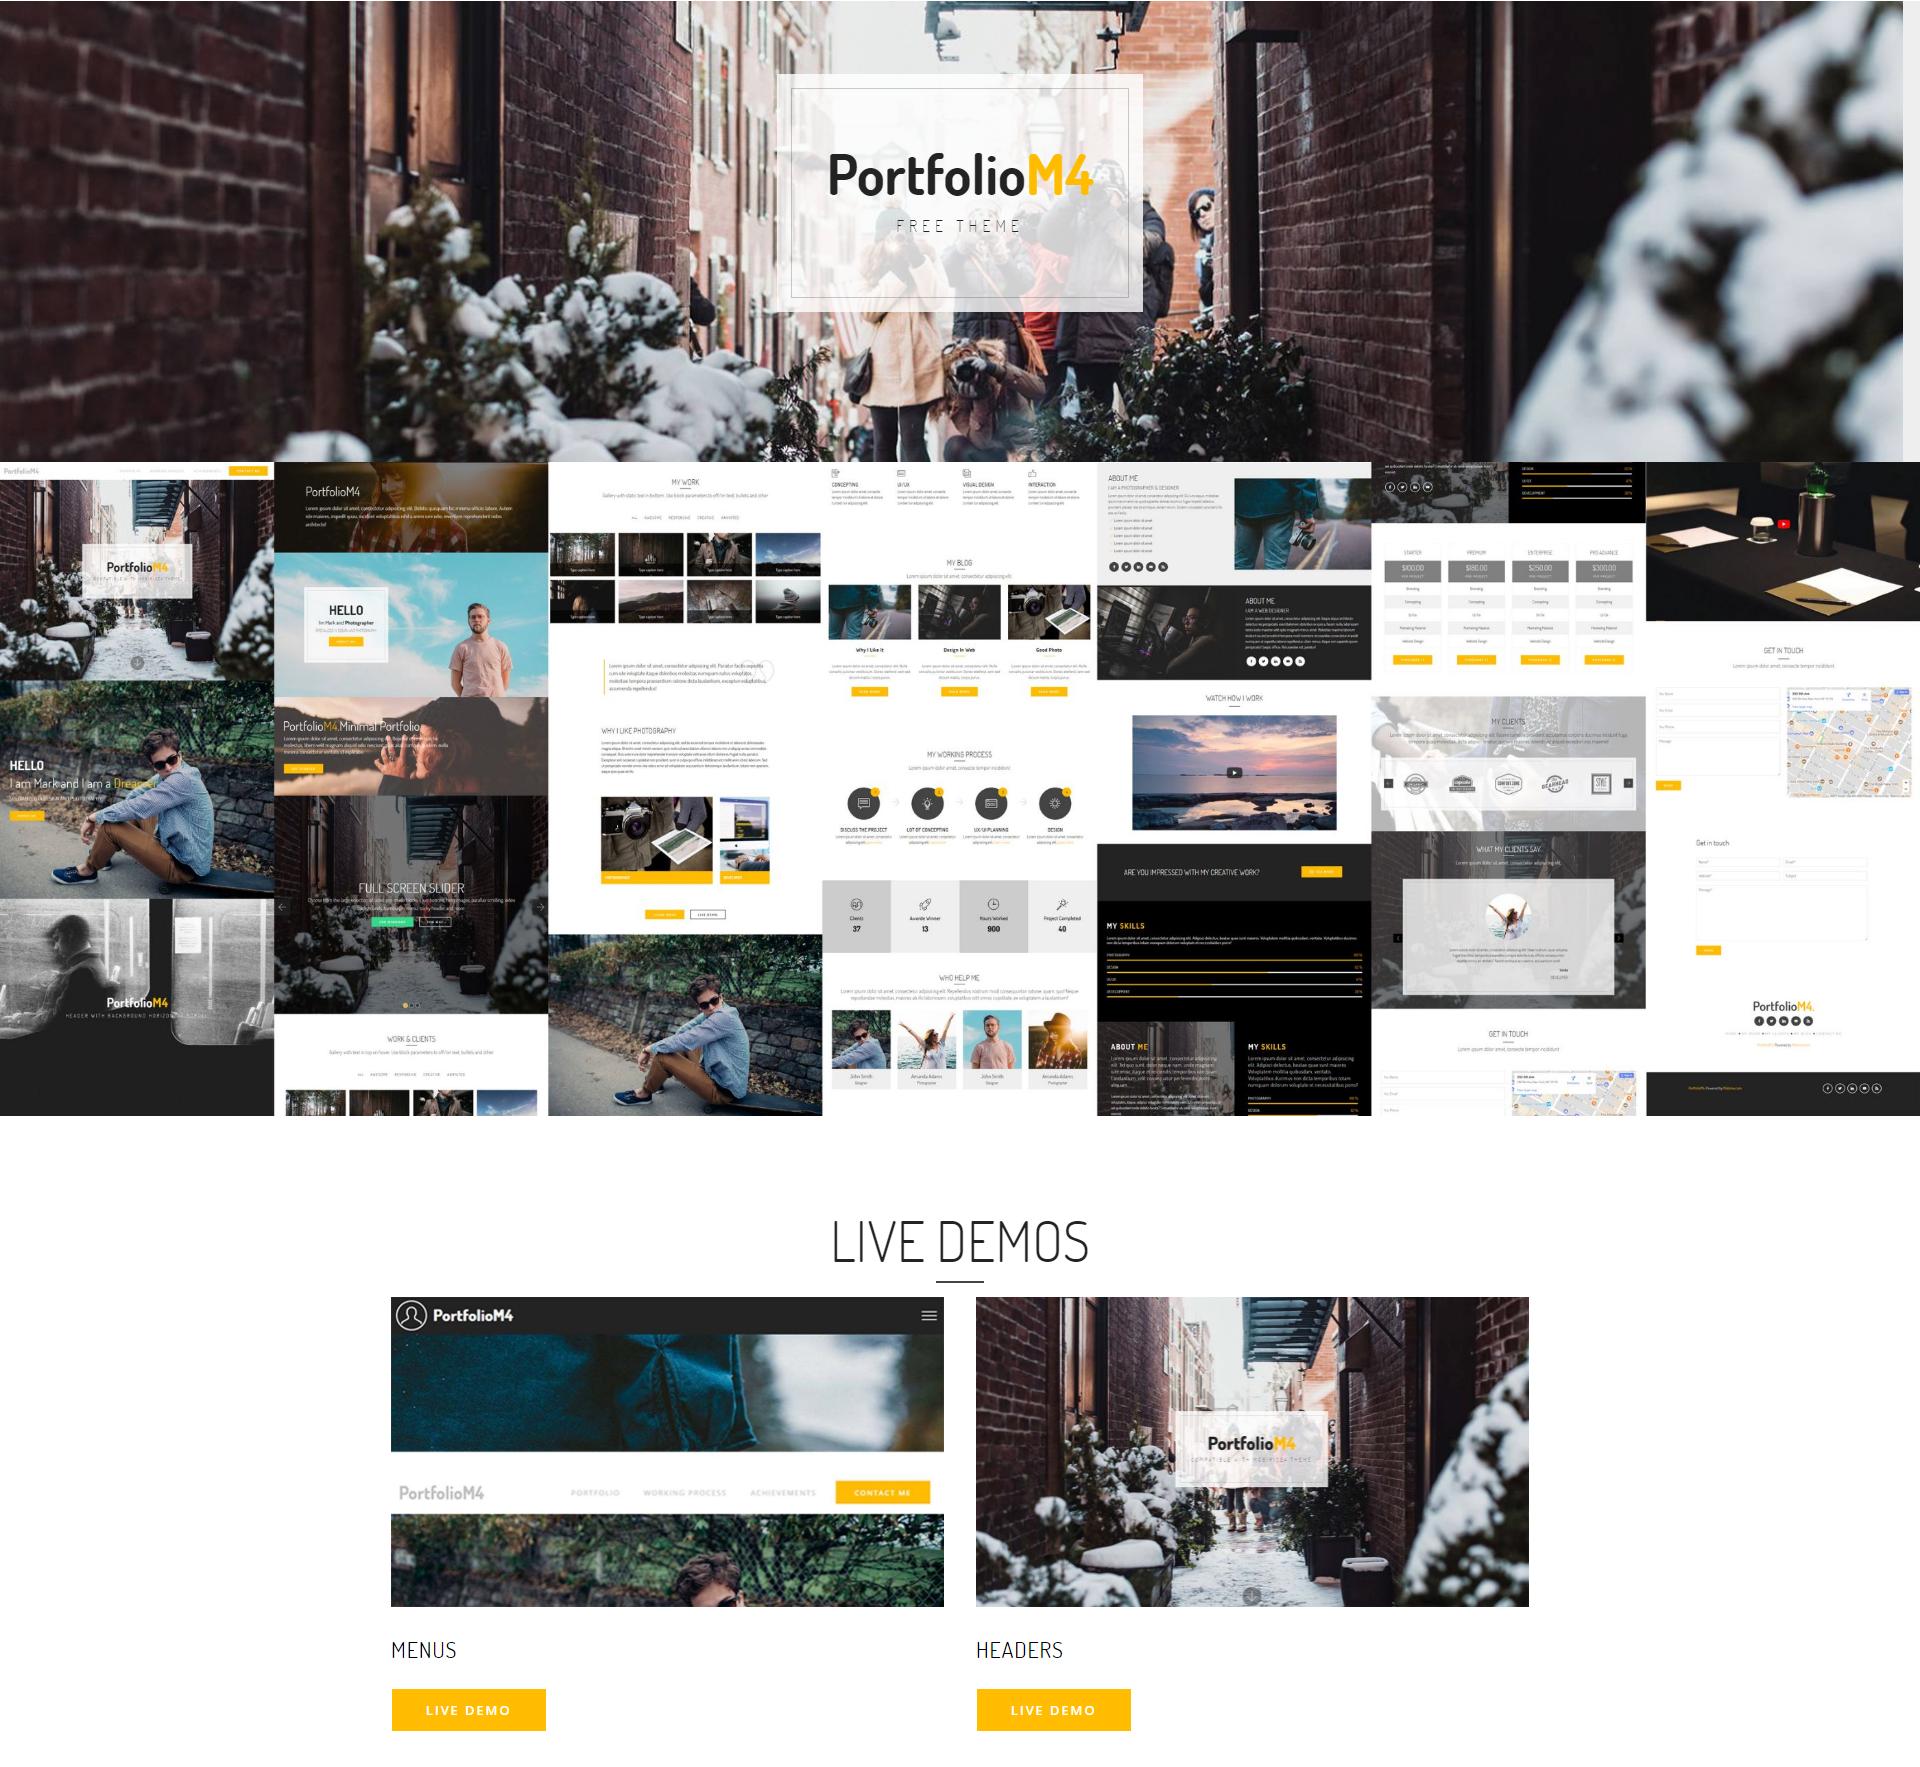 HTML5 Bootstrap PortfolioM4 Themes